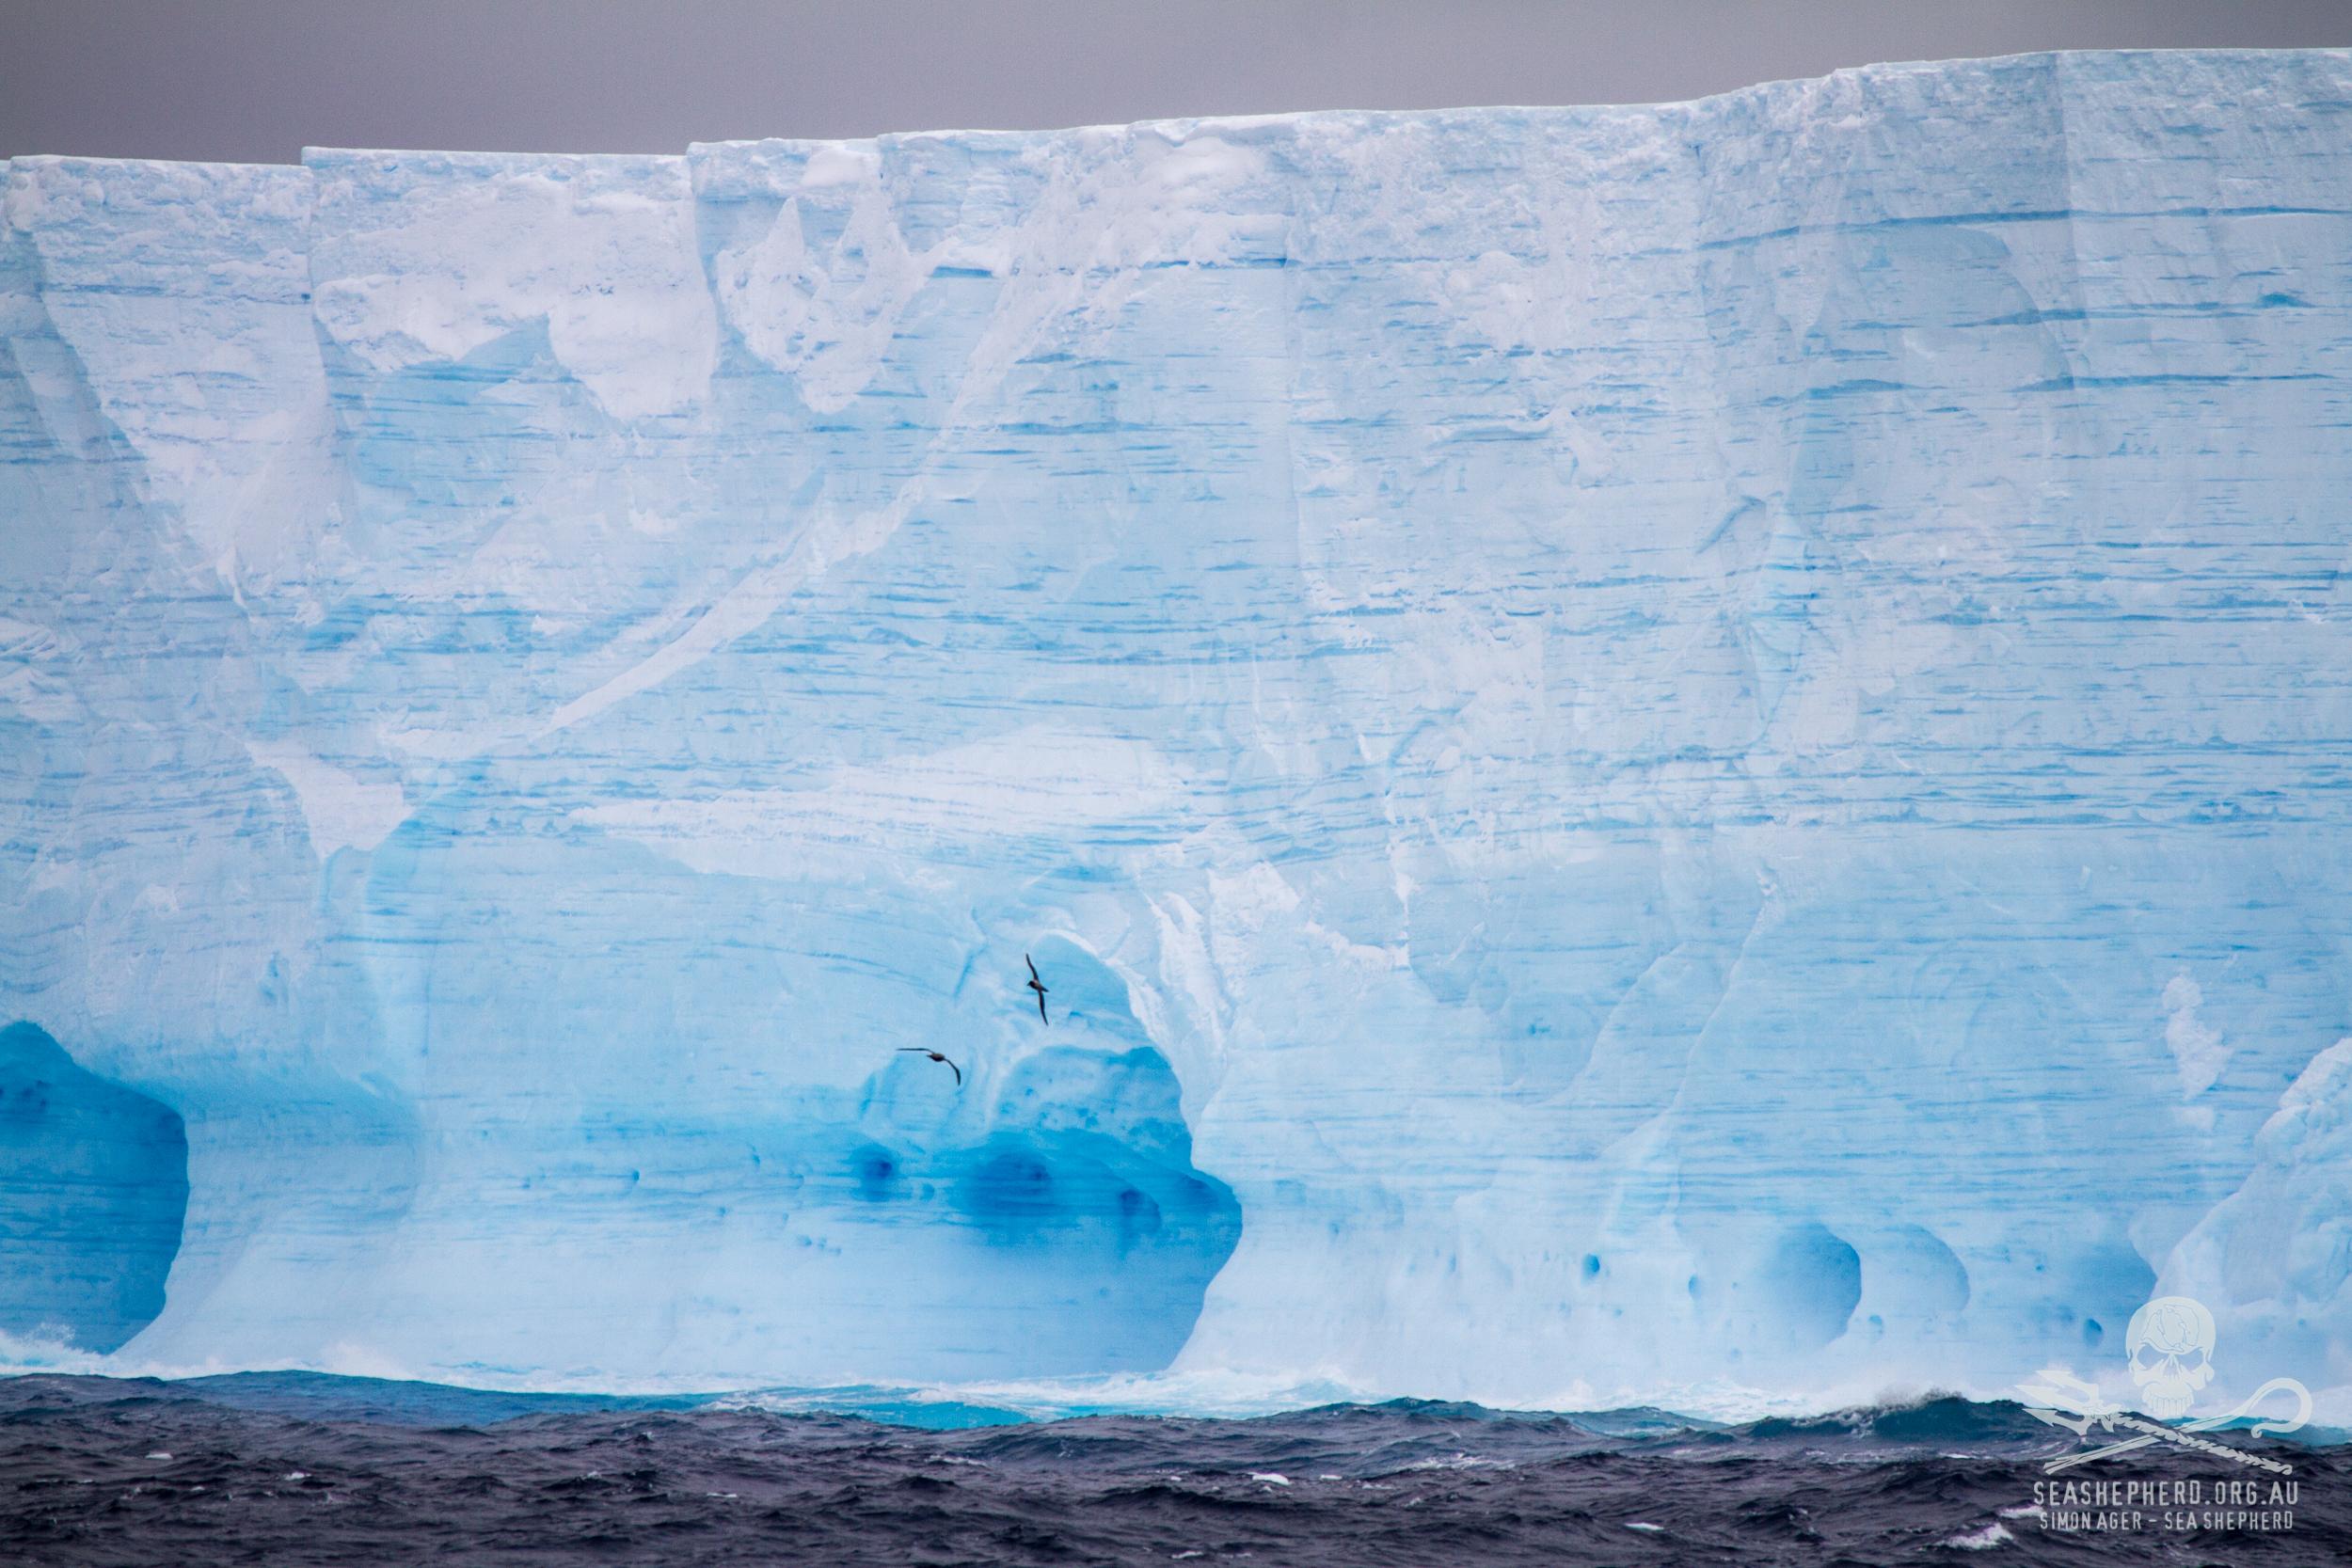 140211-SA-Icebergs-approaching-Balleny-Islands-IMG_5284.jpg